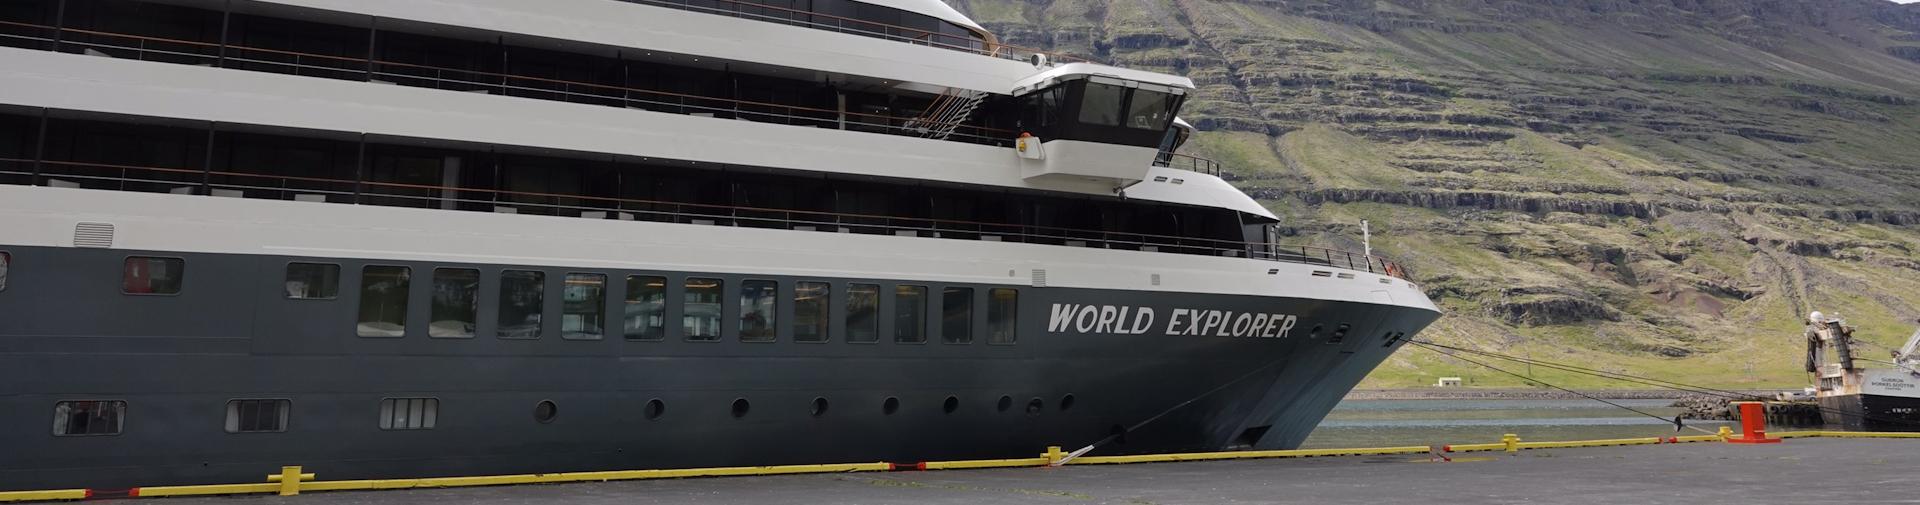 World Nicko Cruises